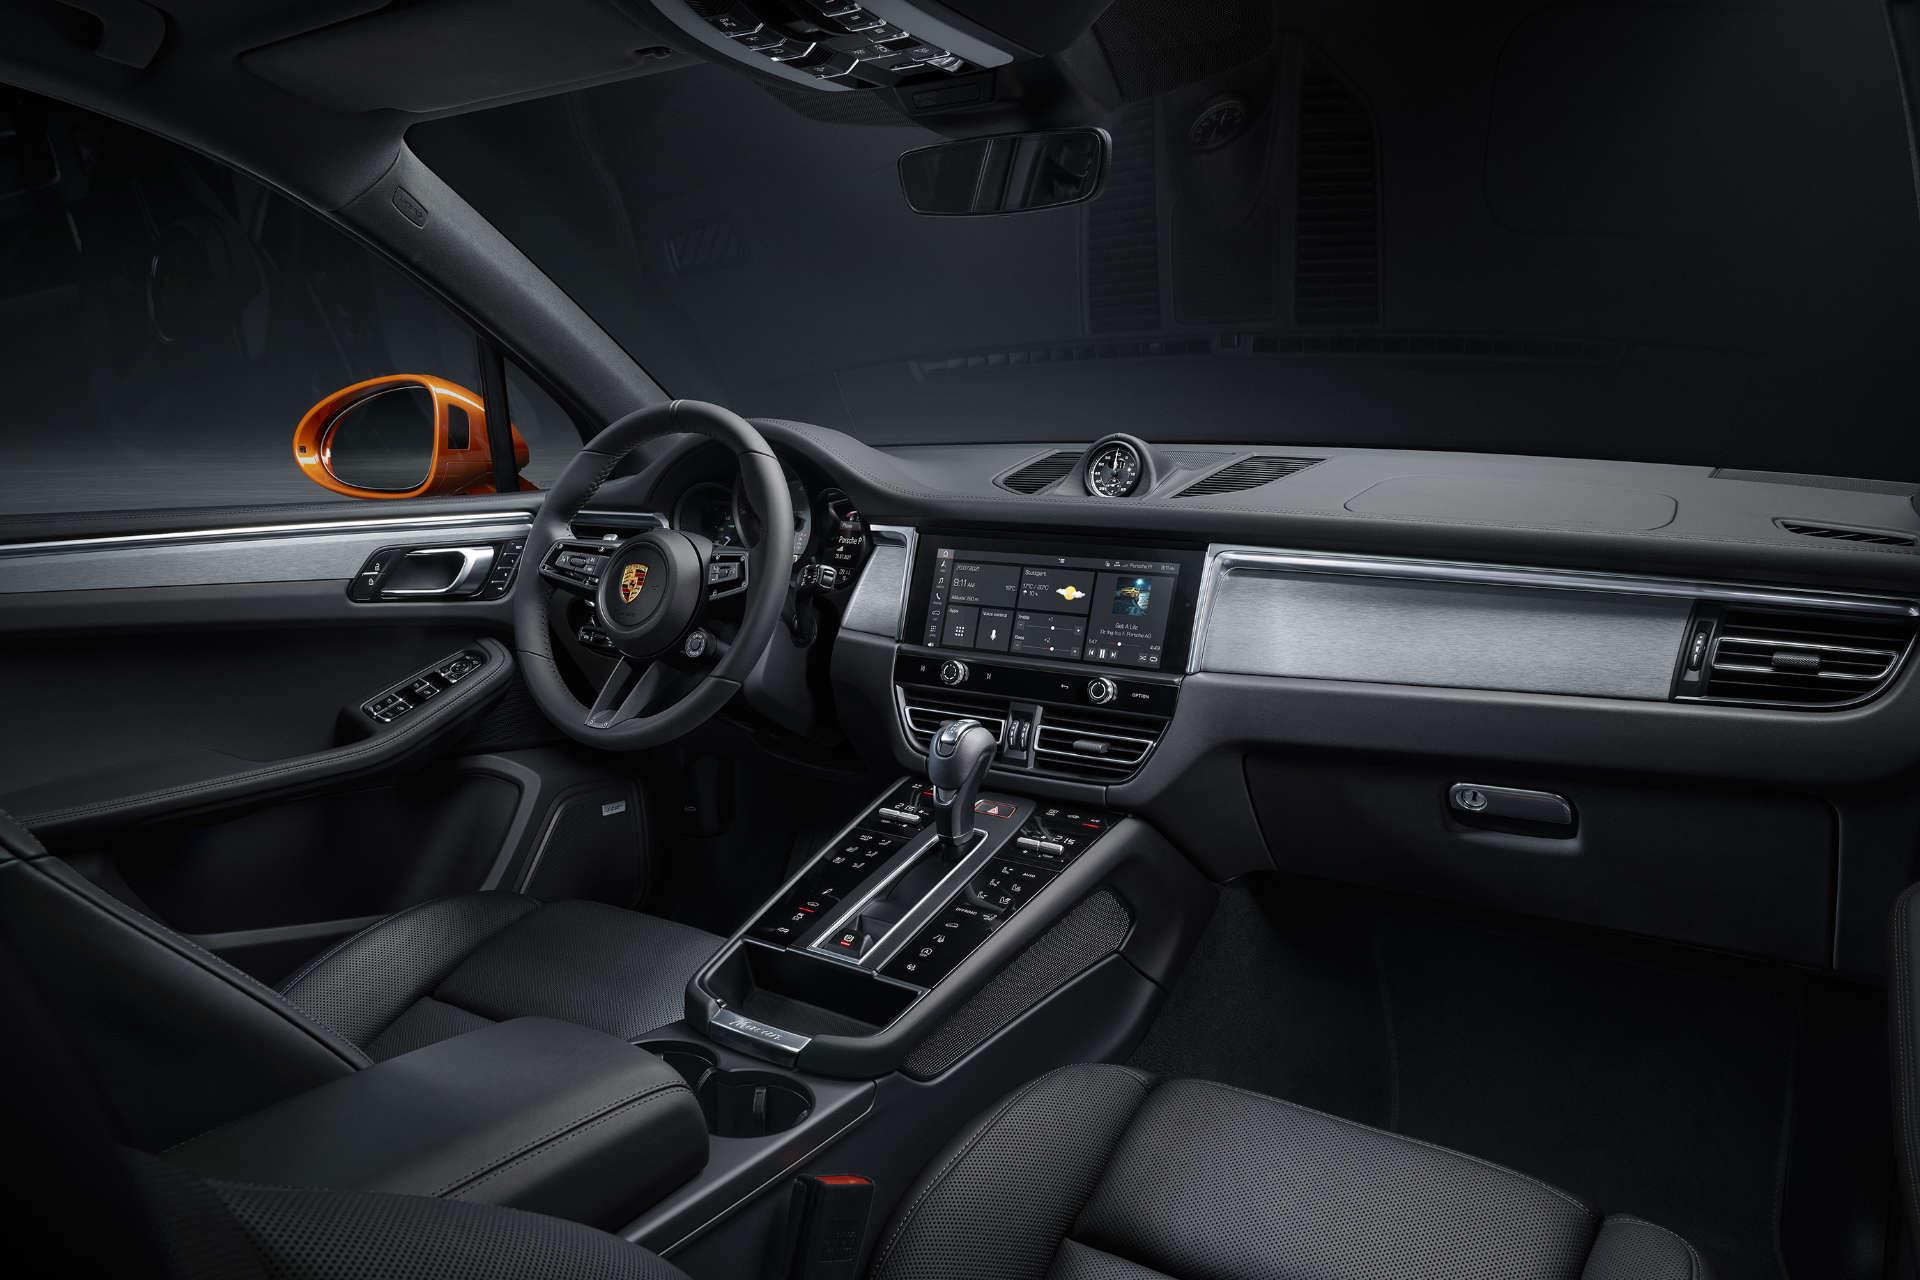 neue Porsche Macan Interieur